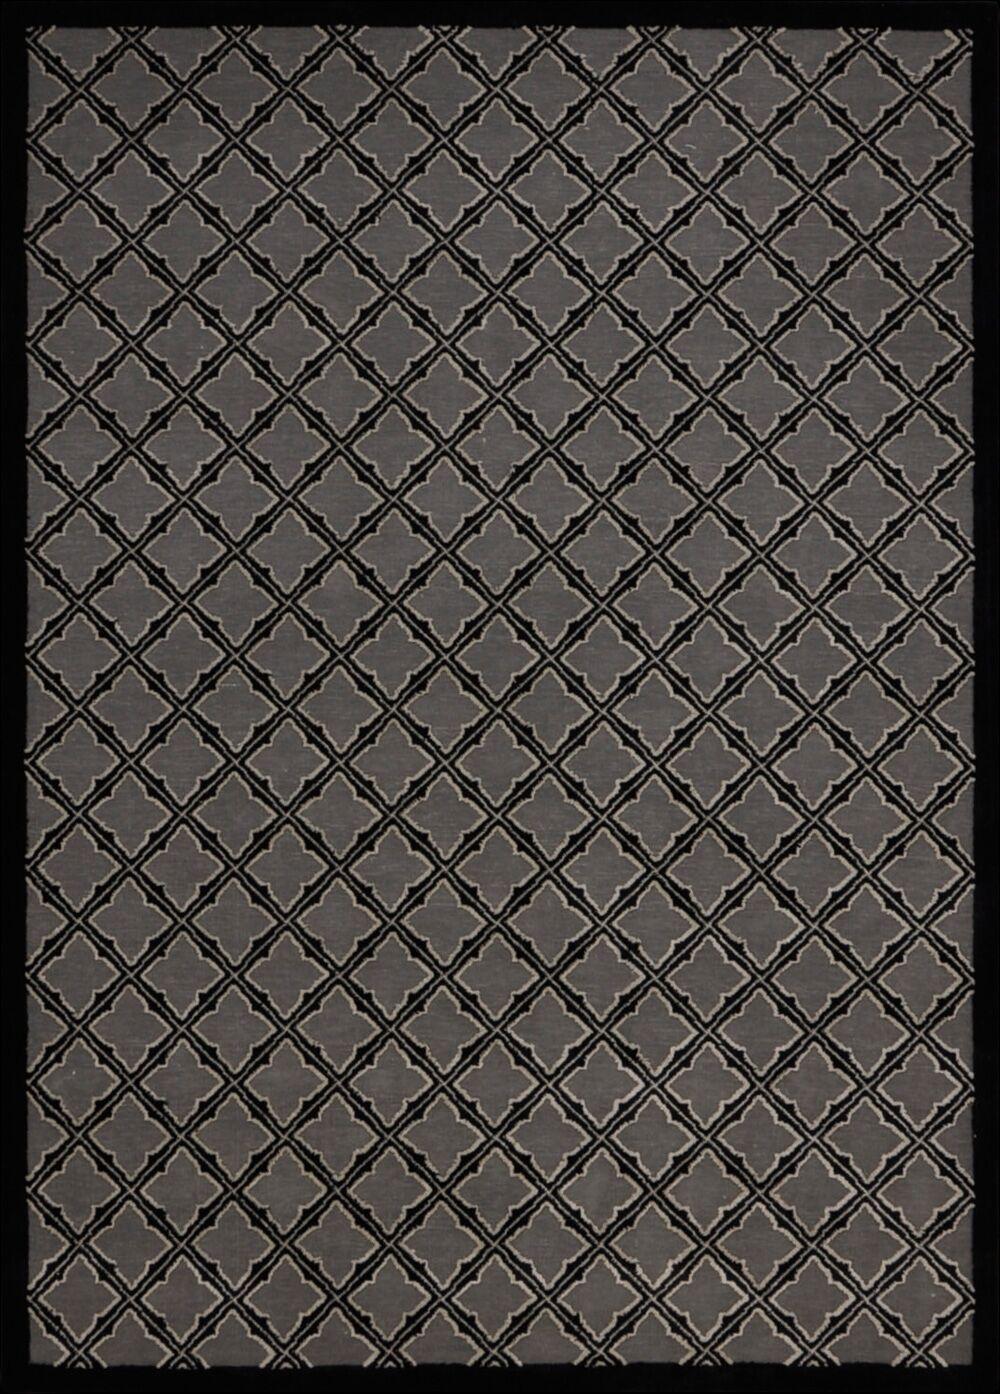 Hartz Silver/Black Area Rug Rug Size: Rectangle 5'3